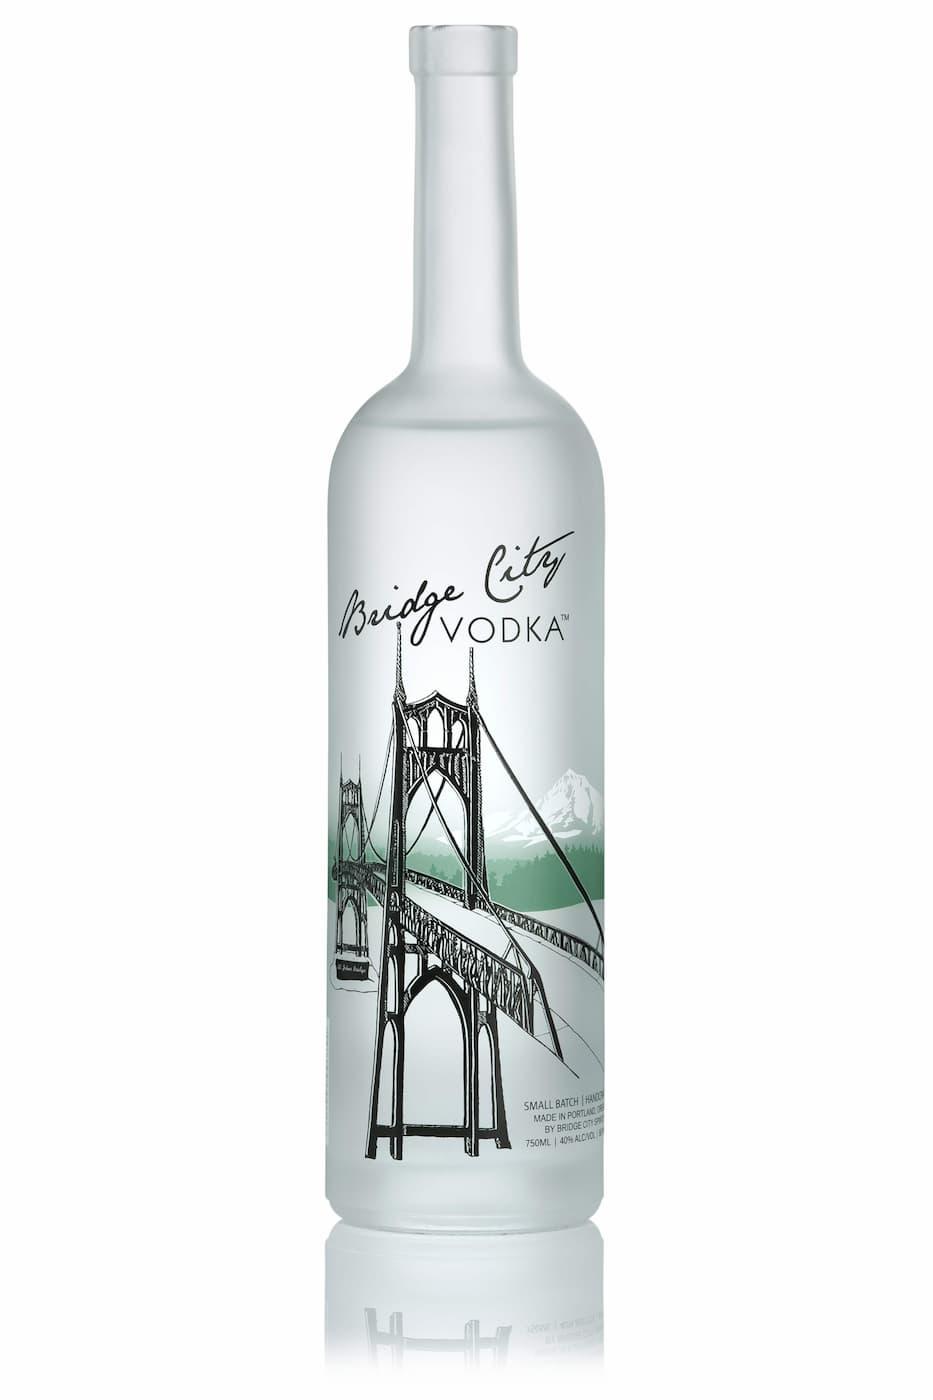 Bridge City Vodka